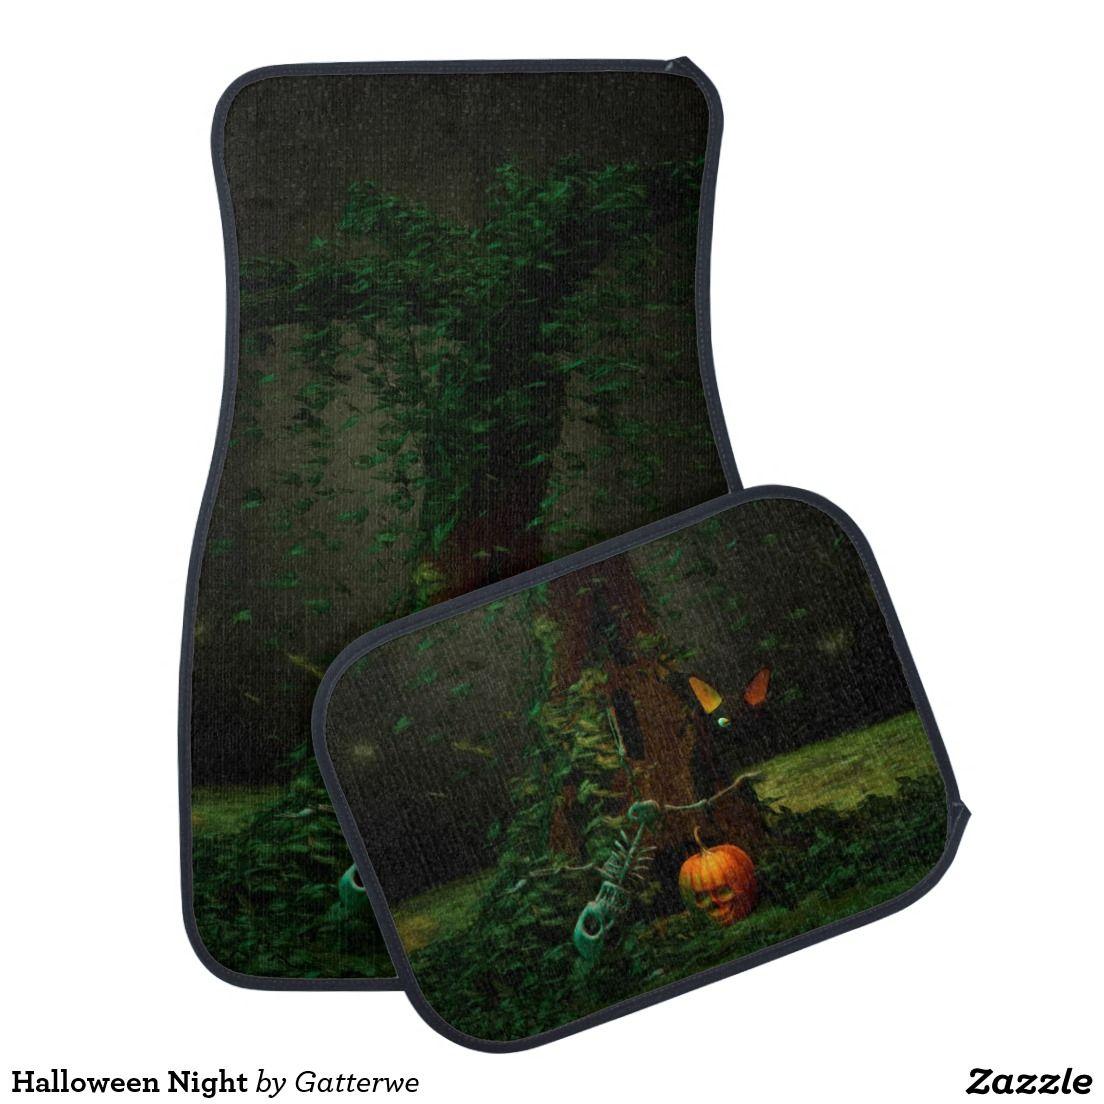 Halloween Night Floor Mat,Artwork designed by Gatterwe